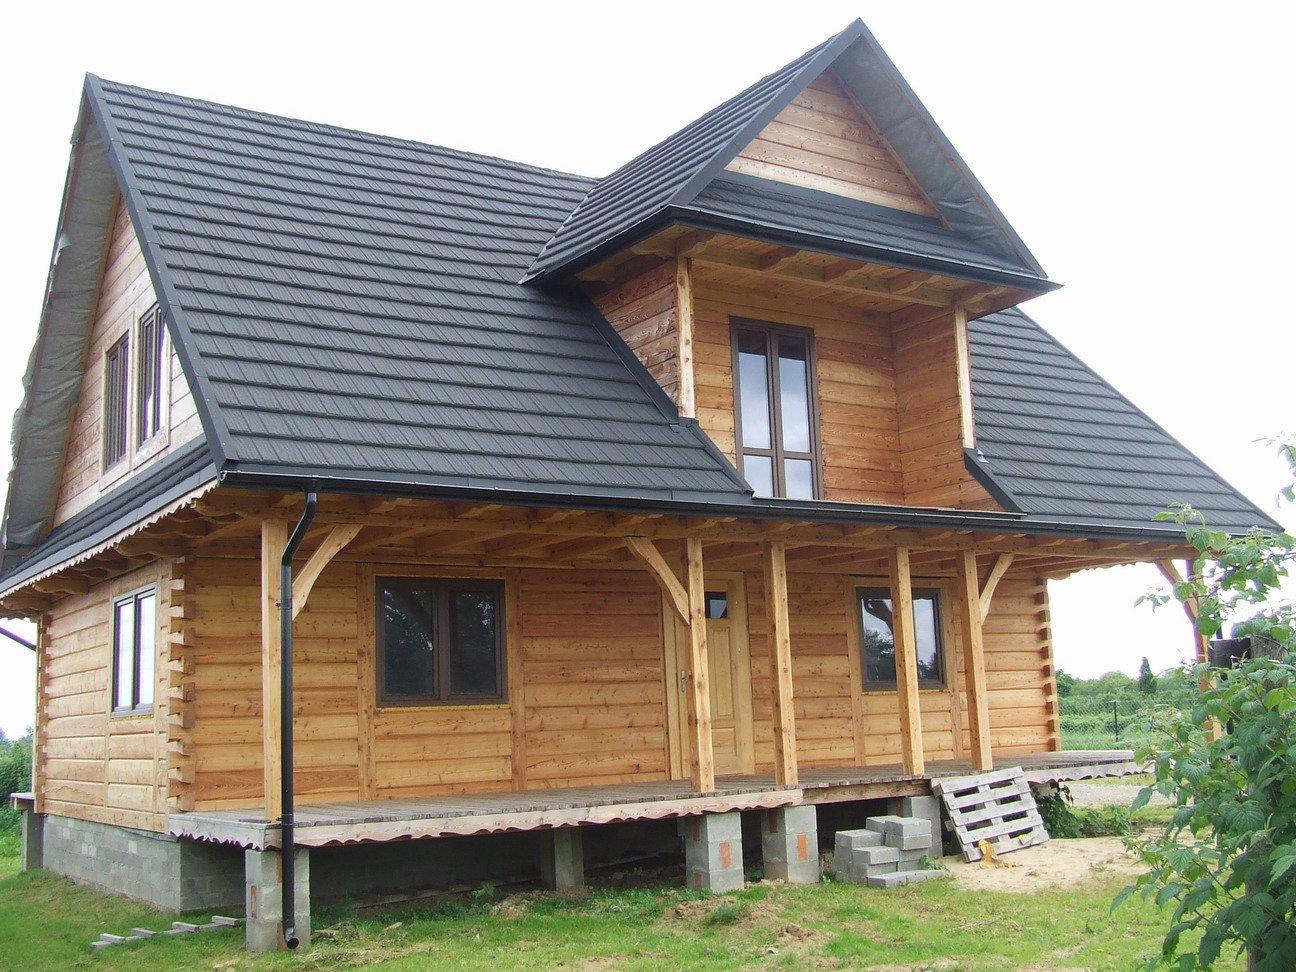 projekt-domu-ranczo-realizacja-fot-3-1374827262-koyhvbxj.jpg